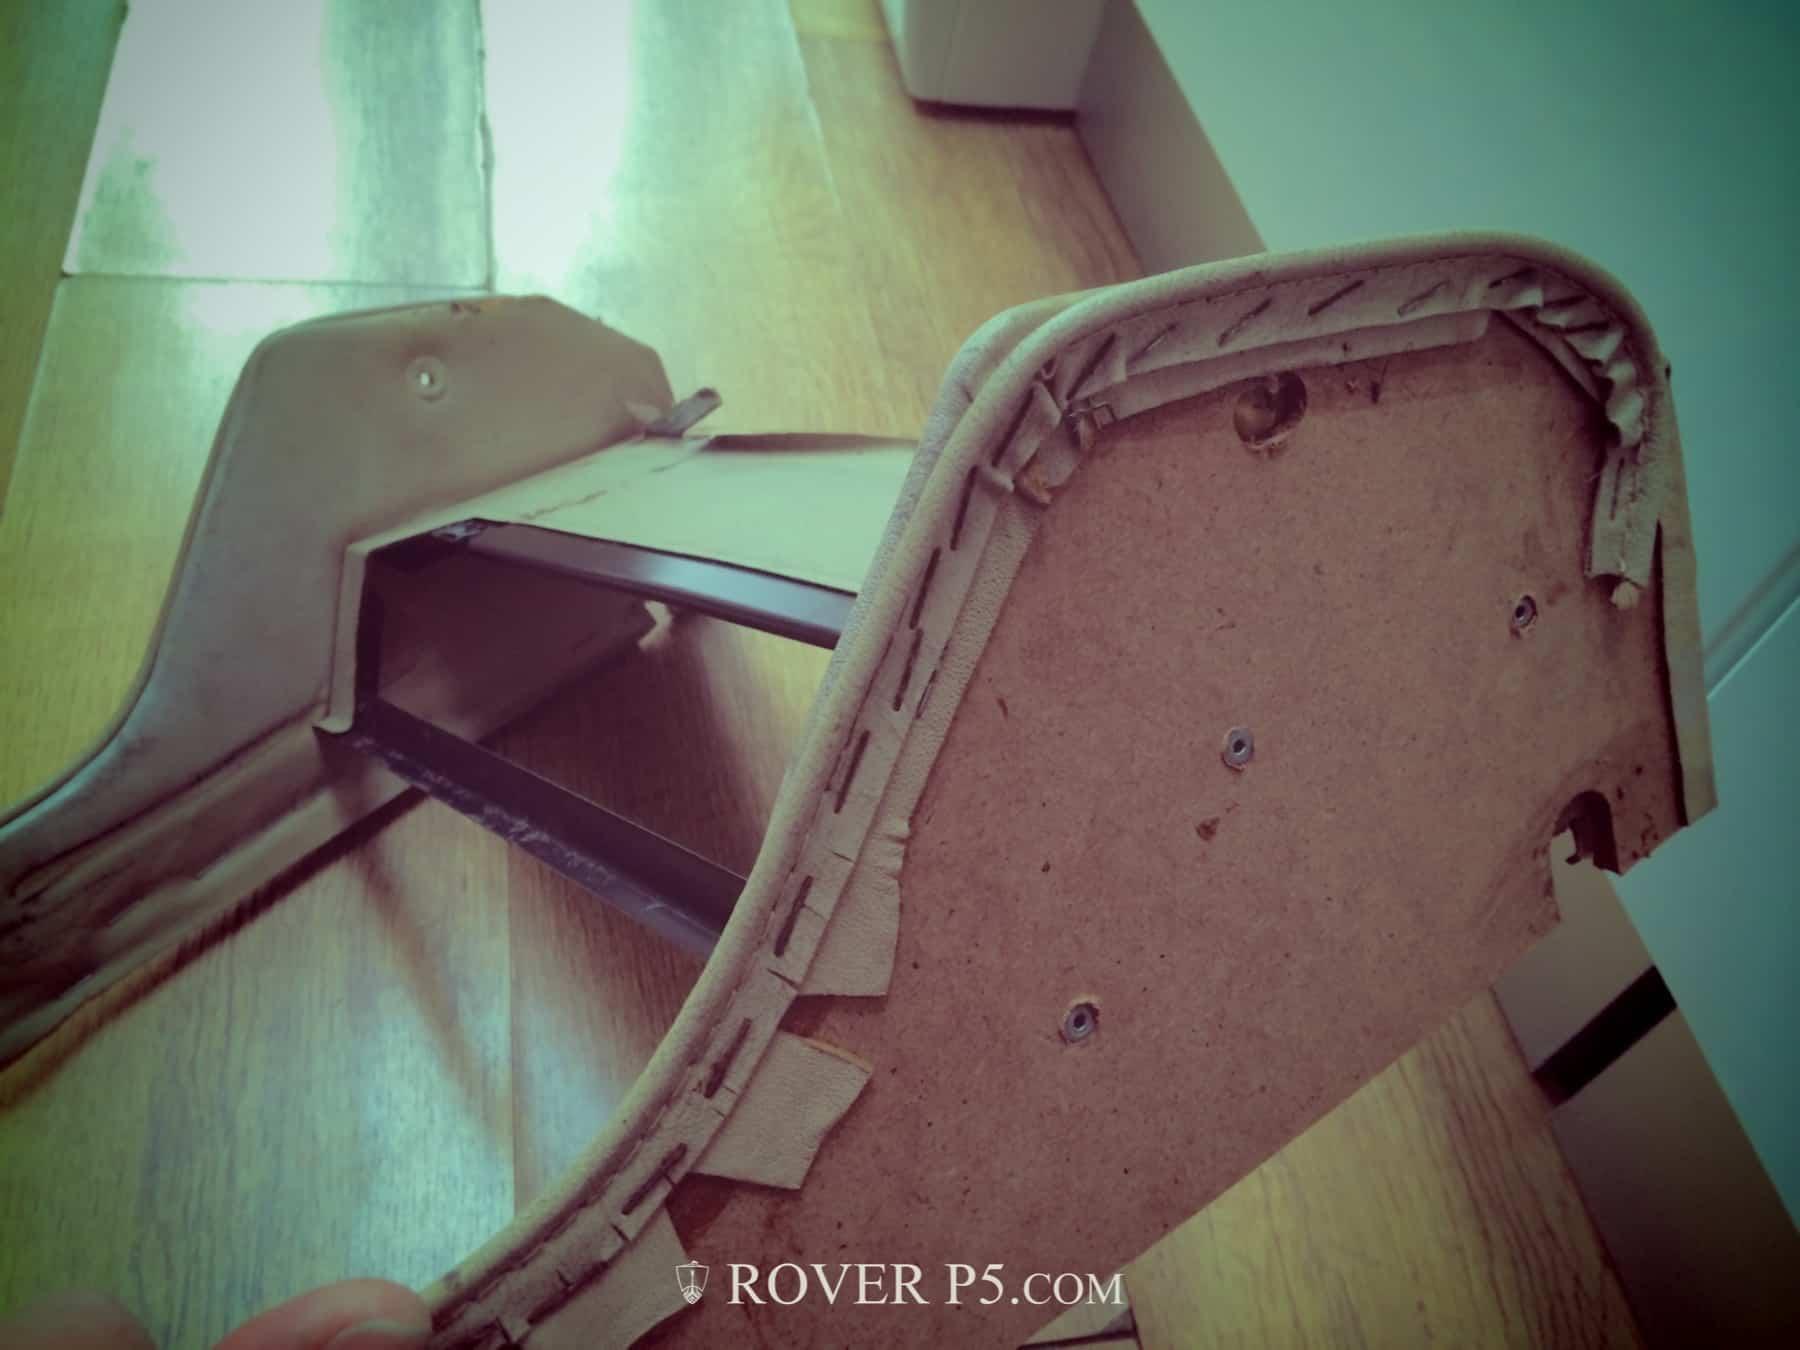 Renovating a Rover P5B Centre Console